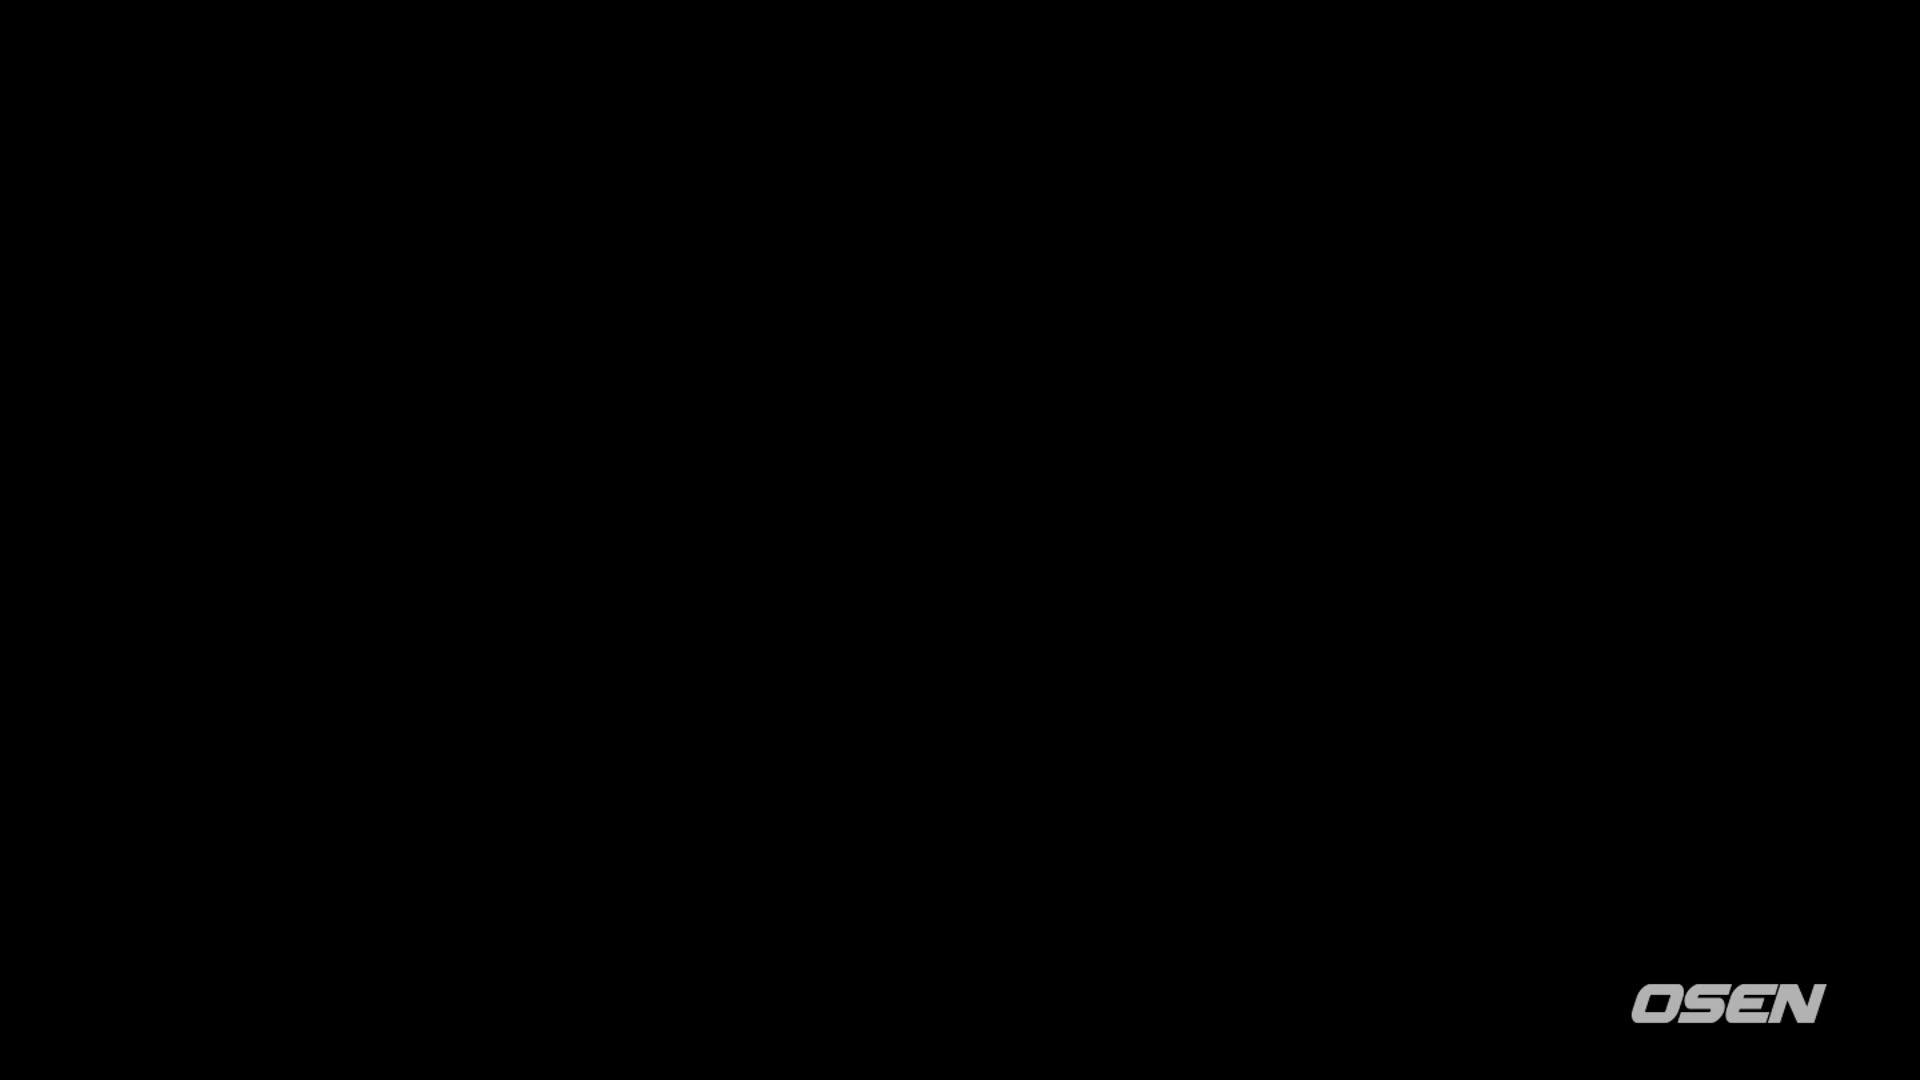 IZ*ONE 아이즈원 조유리X김채원, 러블리 그 자체..매력부자 쌈율 #스타로드 하이라이트3